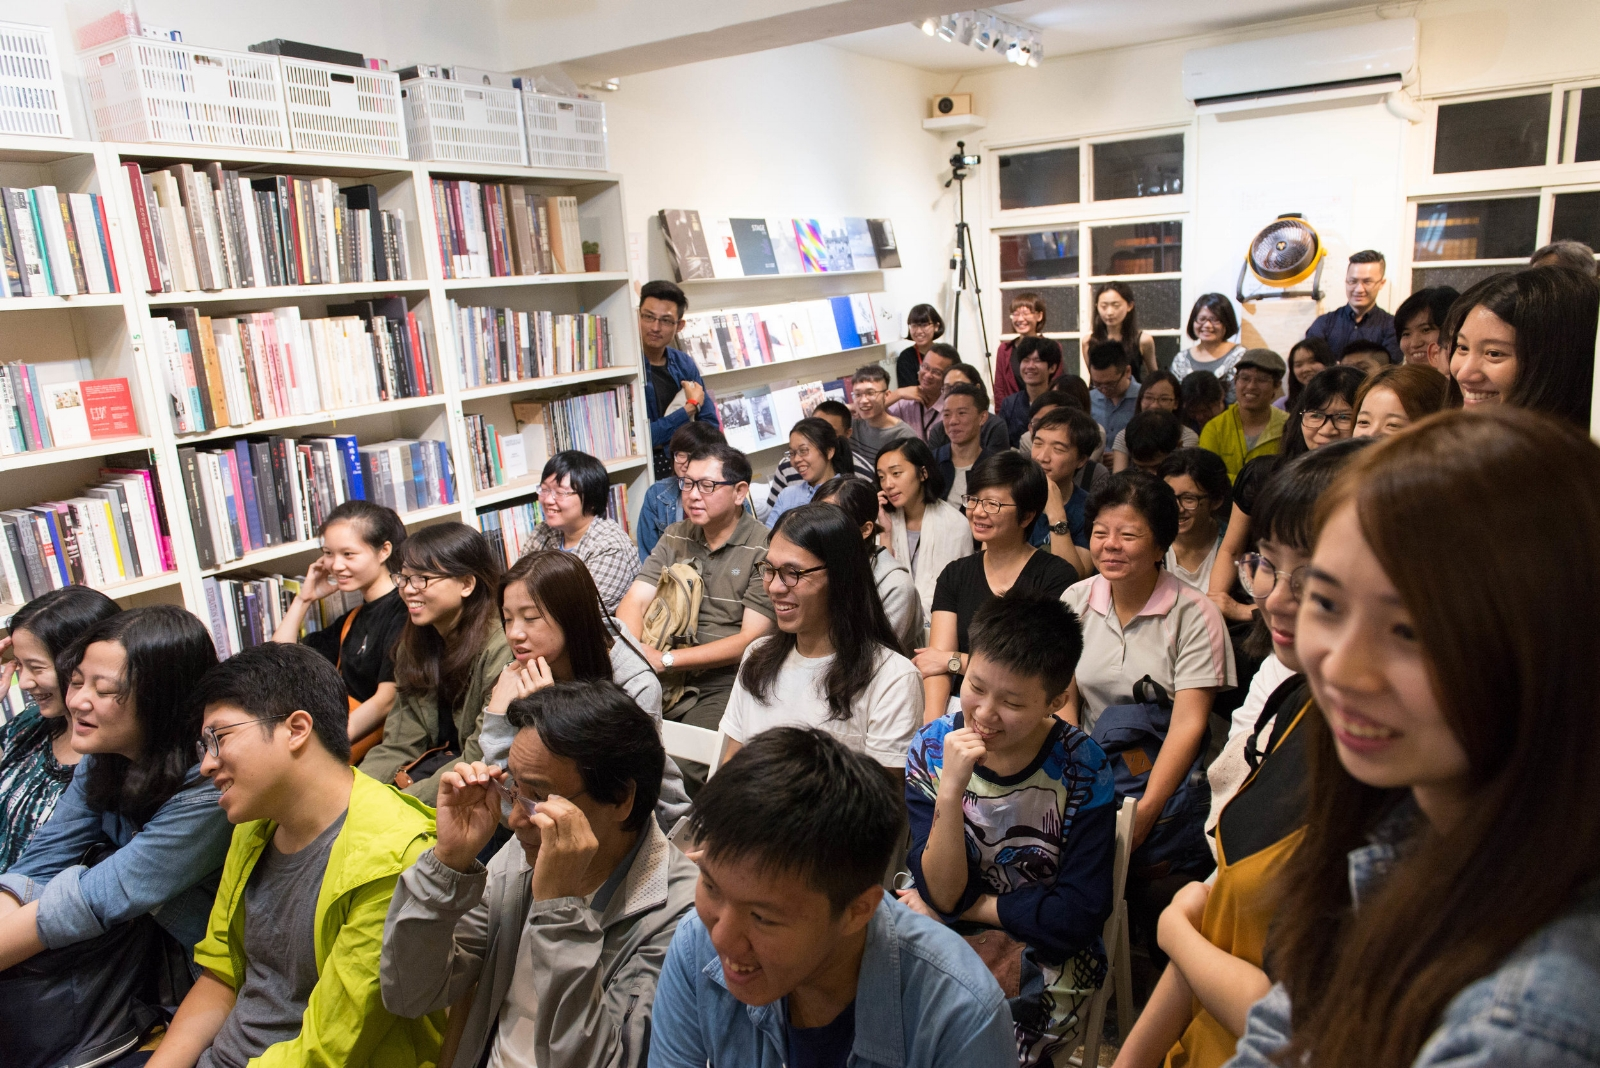 2017_Ann Wang_講座當天的現場觀眾,許多觀眾提問,與講者輕鬆互動,不時傳來歡笑聲.jpg